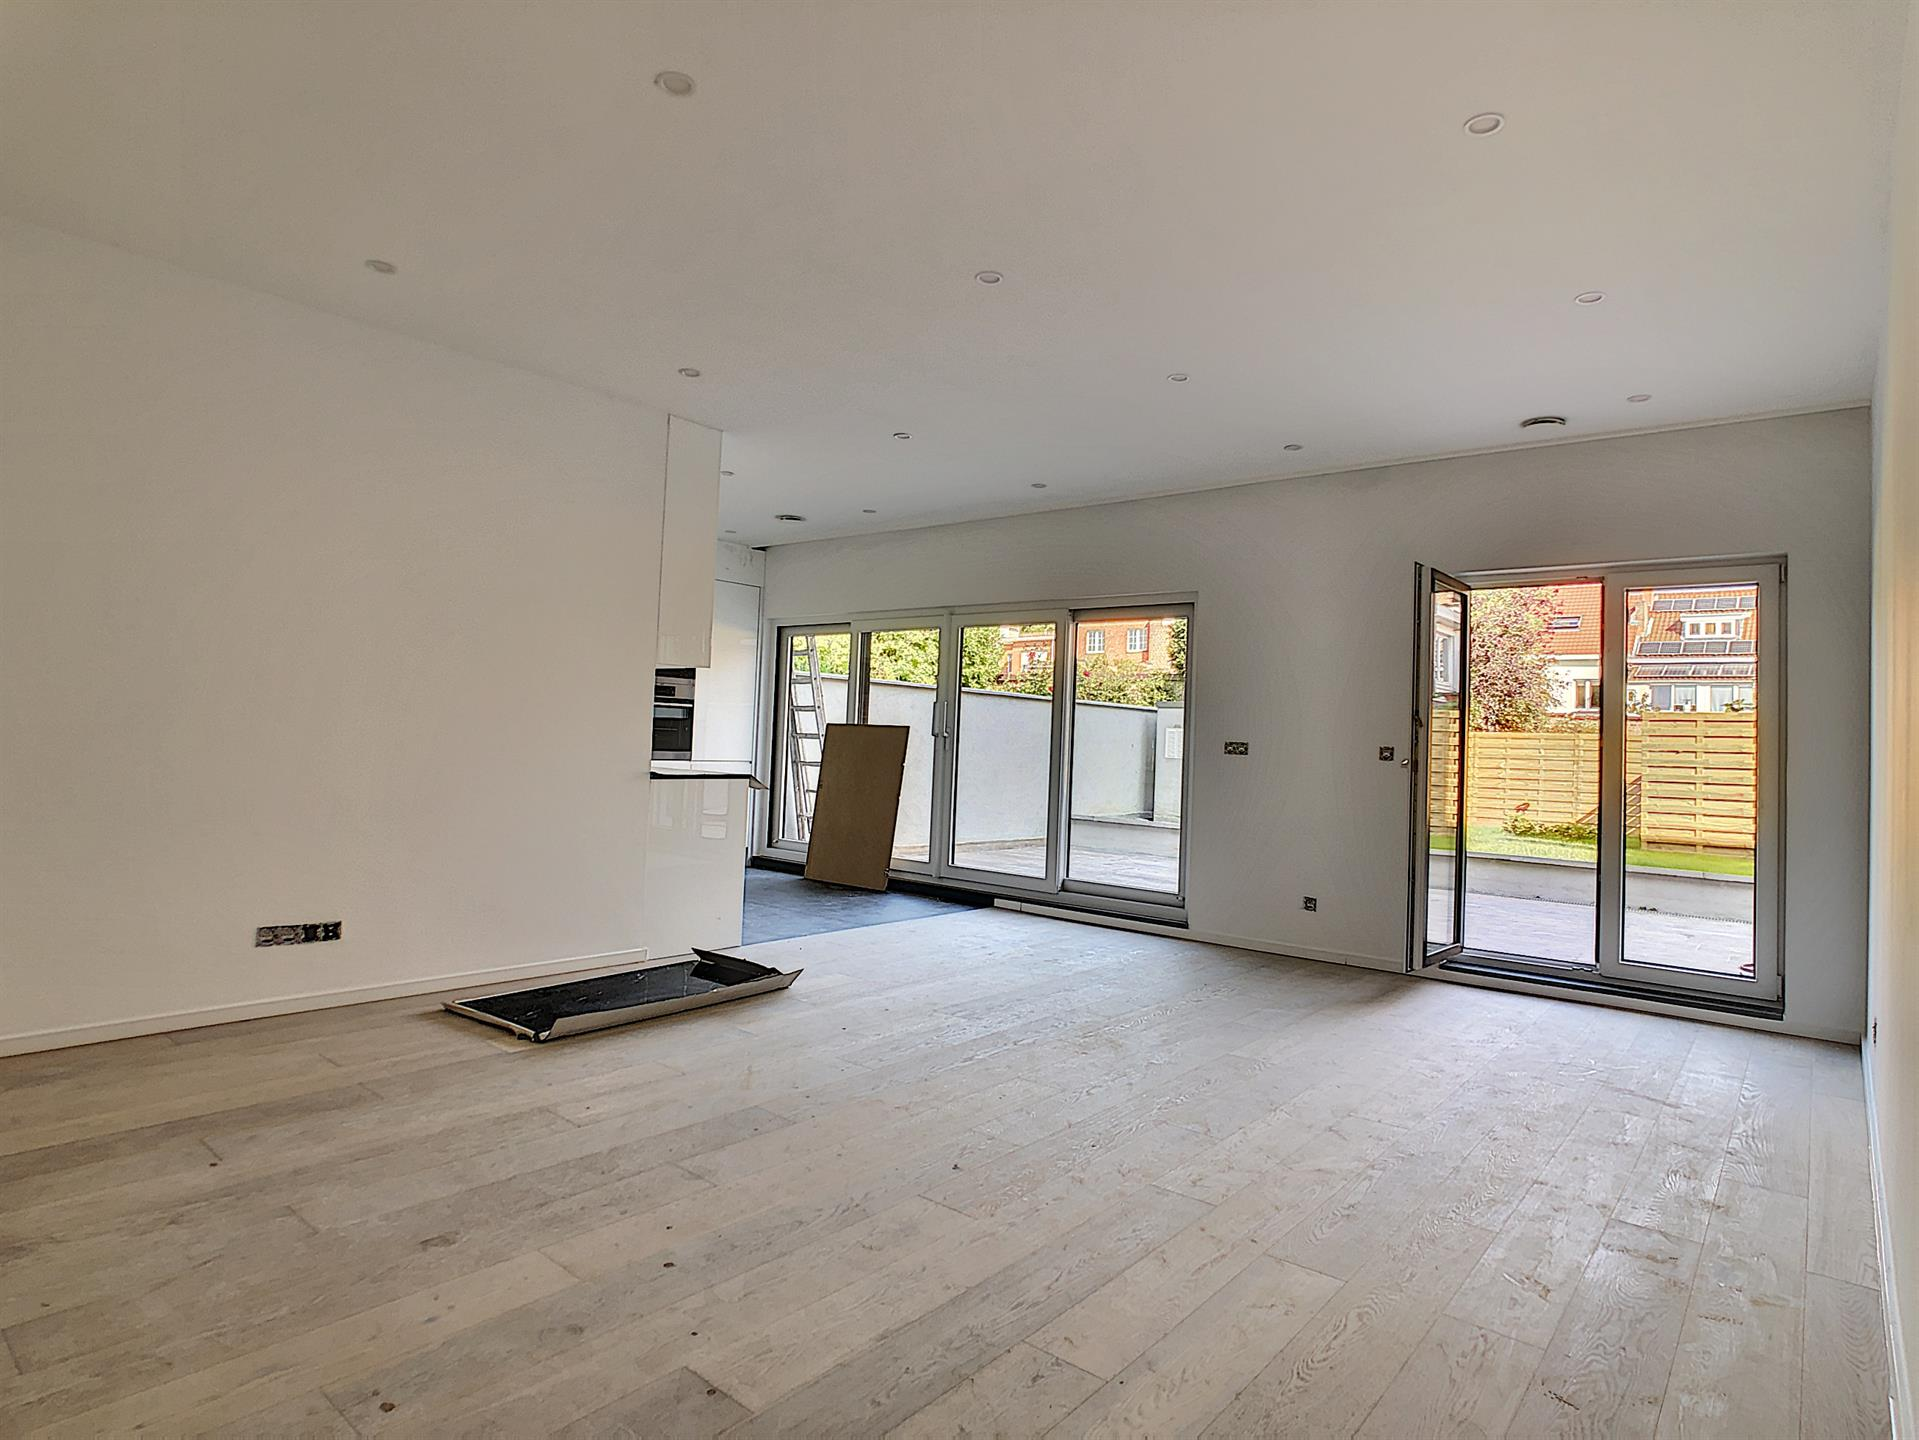 Appartement - Anderlecht - #4252375-17